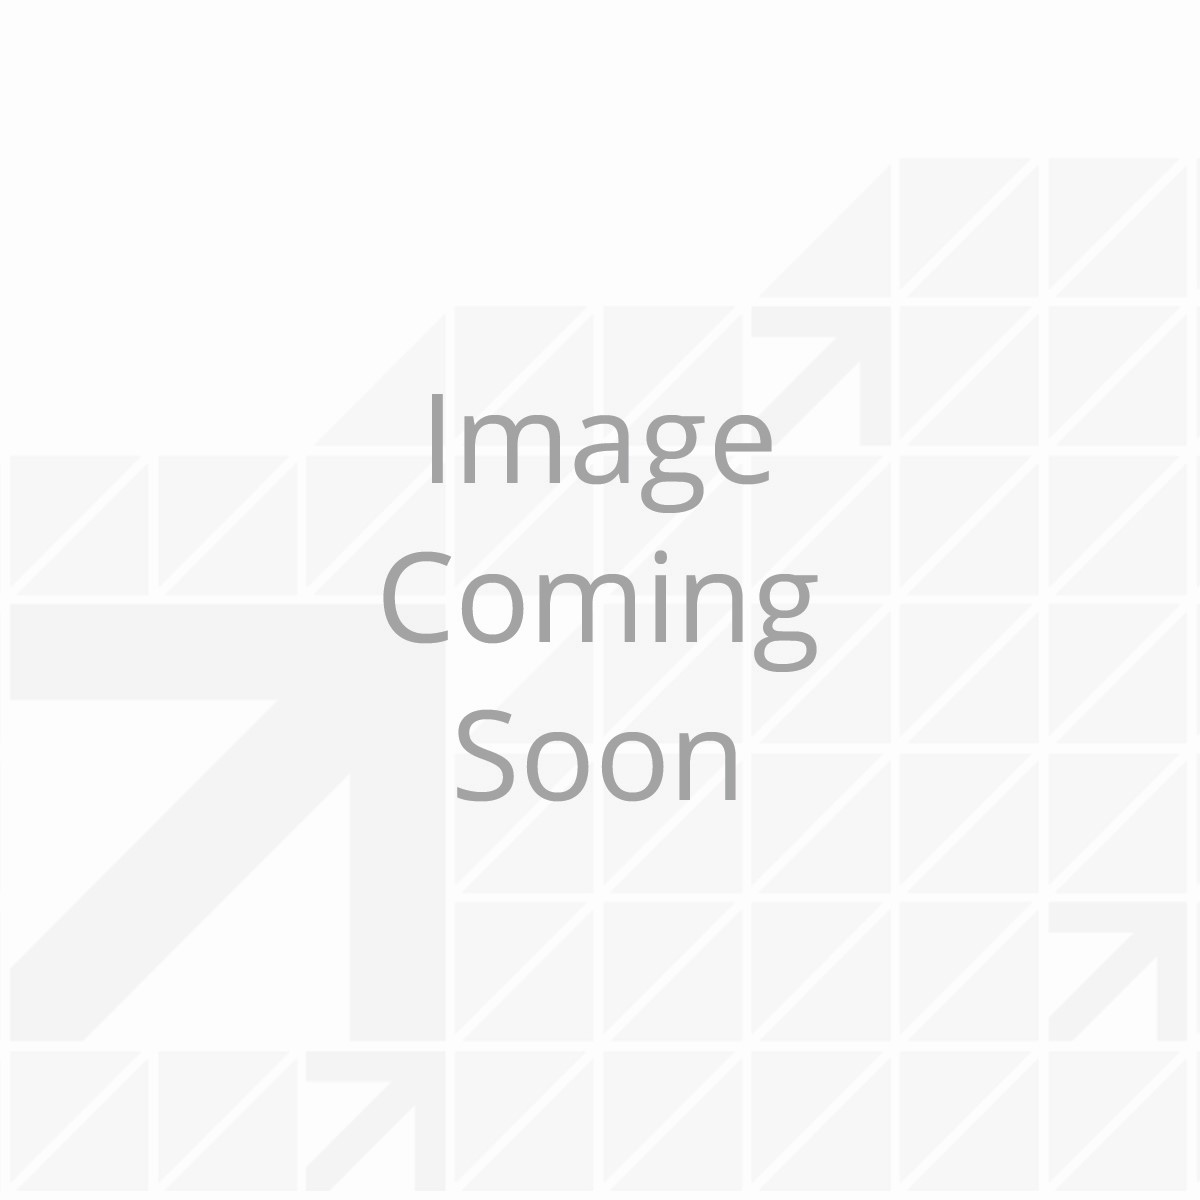 8' Awnbrella™ Fabric Support Kit - 2 Bows